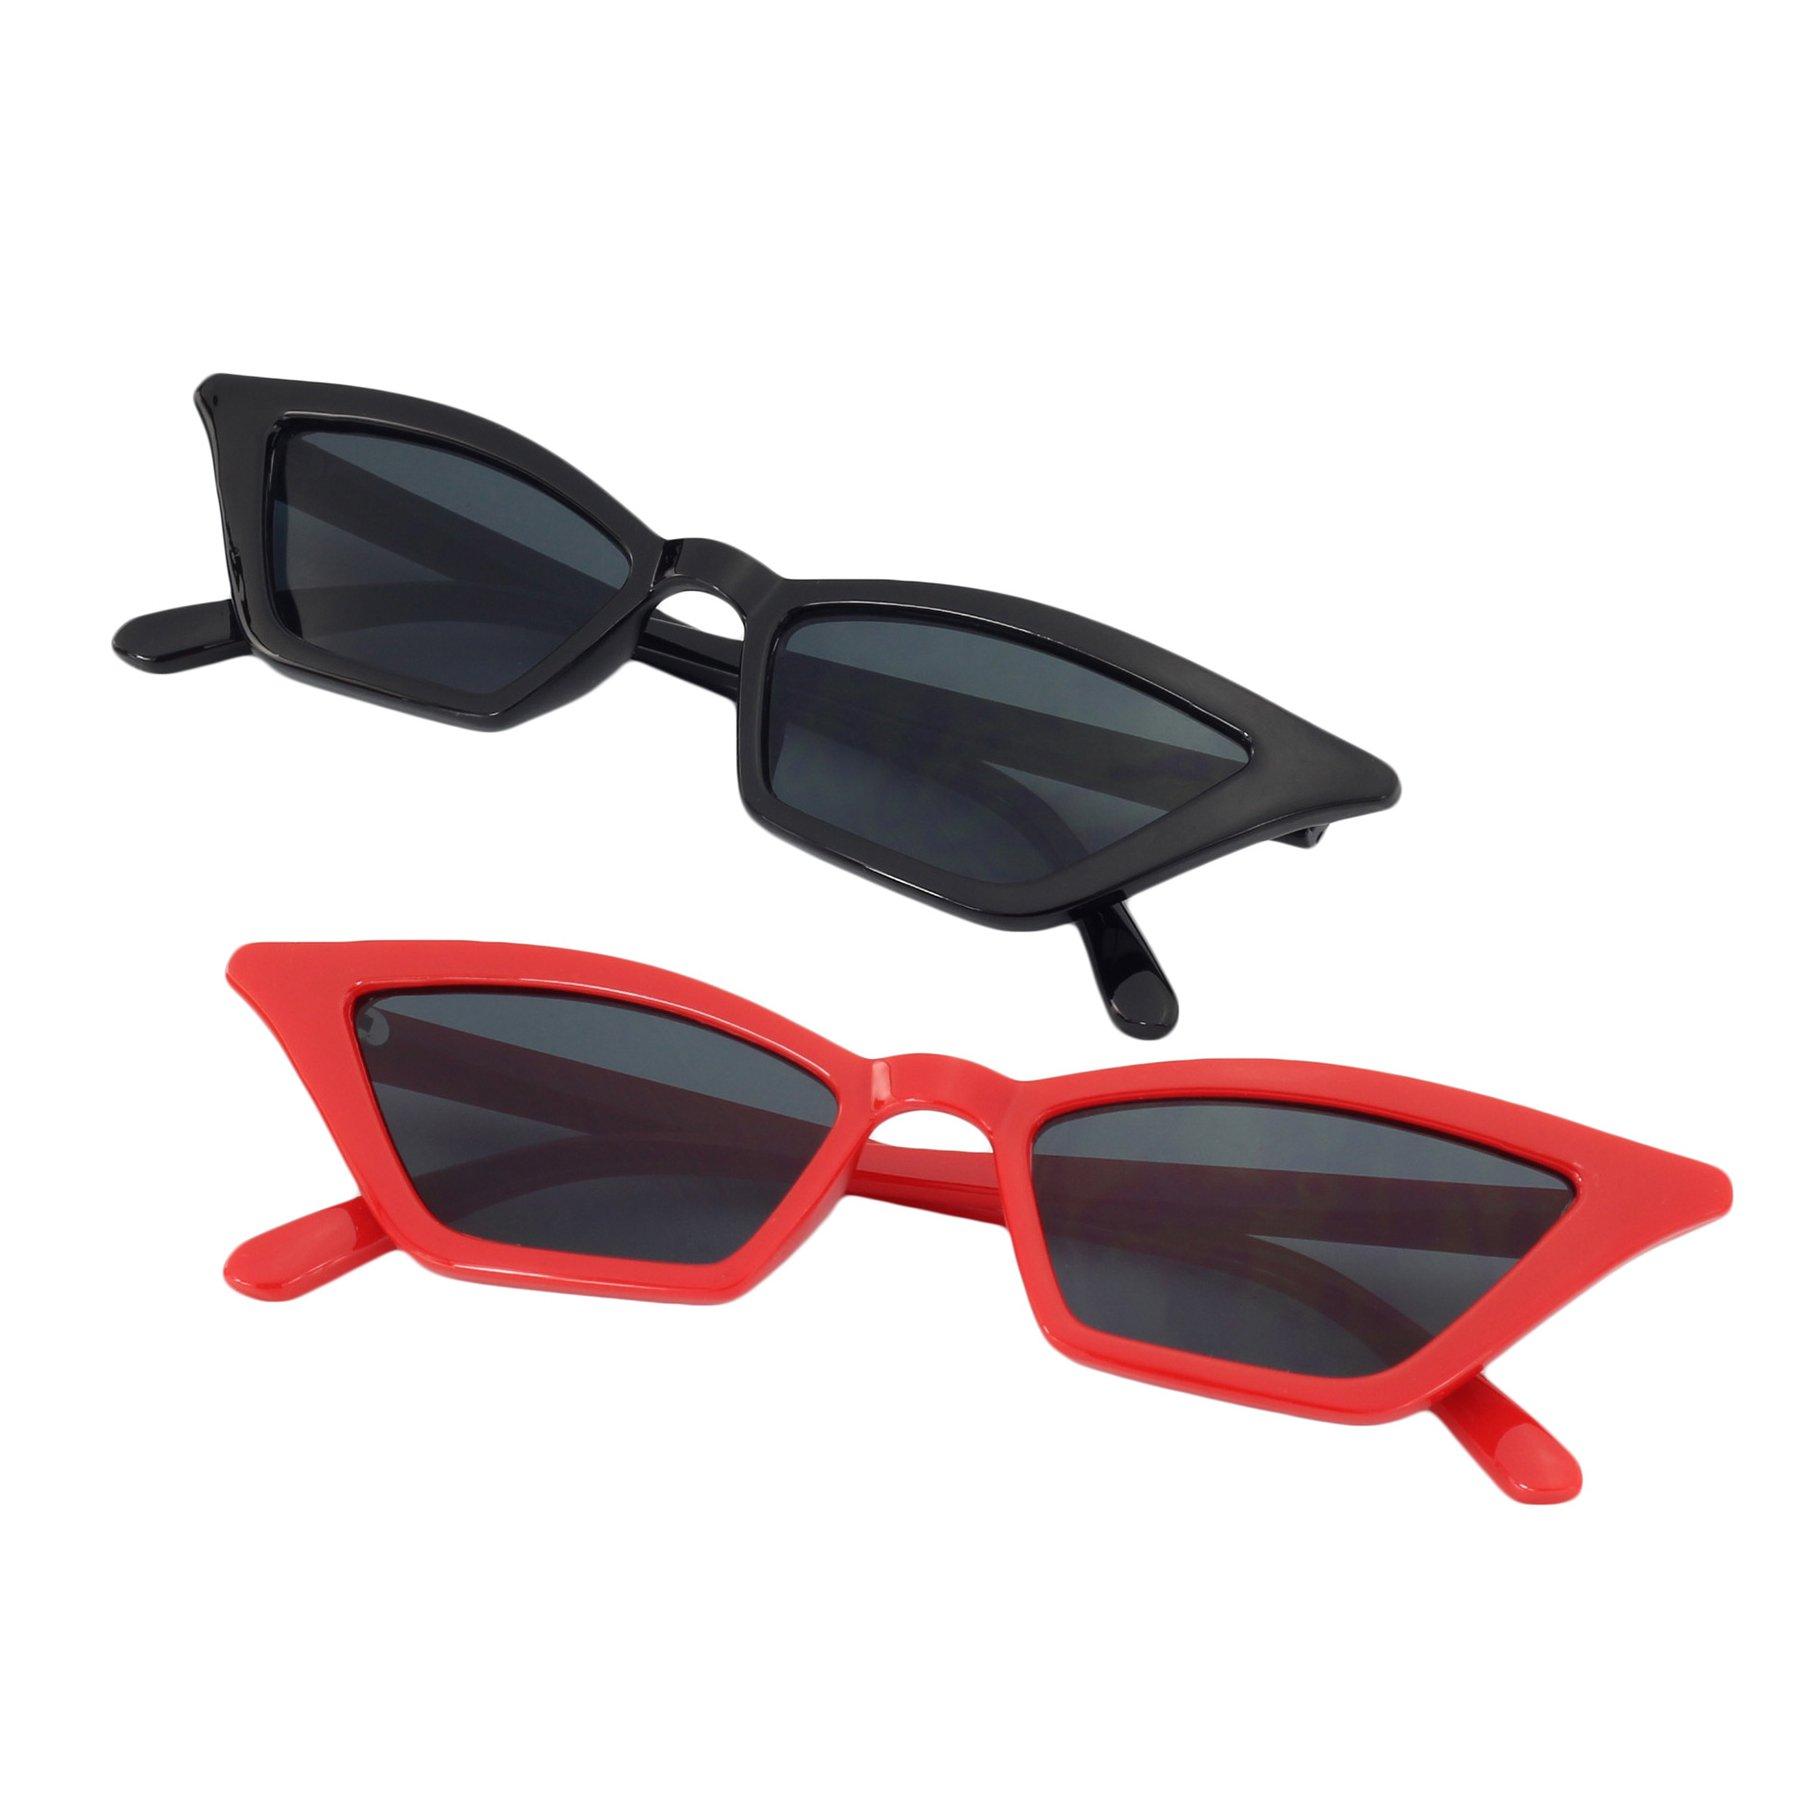 SteamedBun Skinny Sunglasses for Women Retro Cateye Glasses Slim Shades 2018